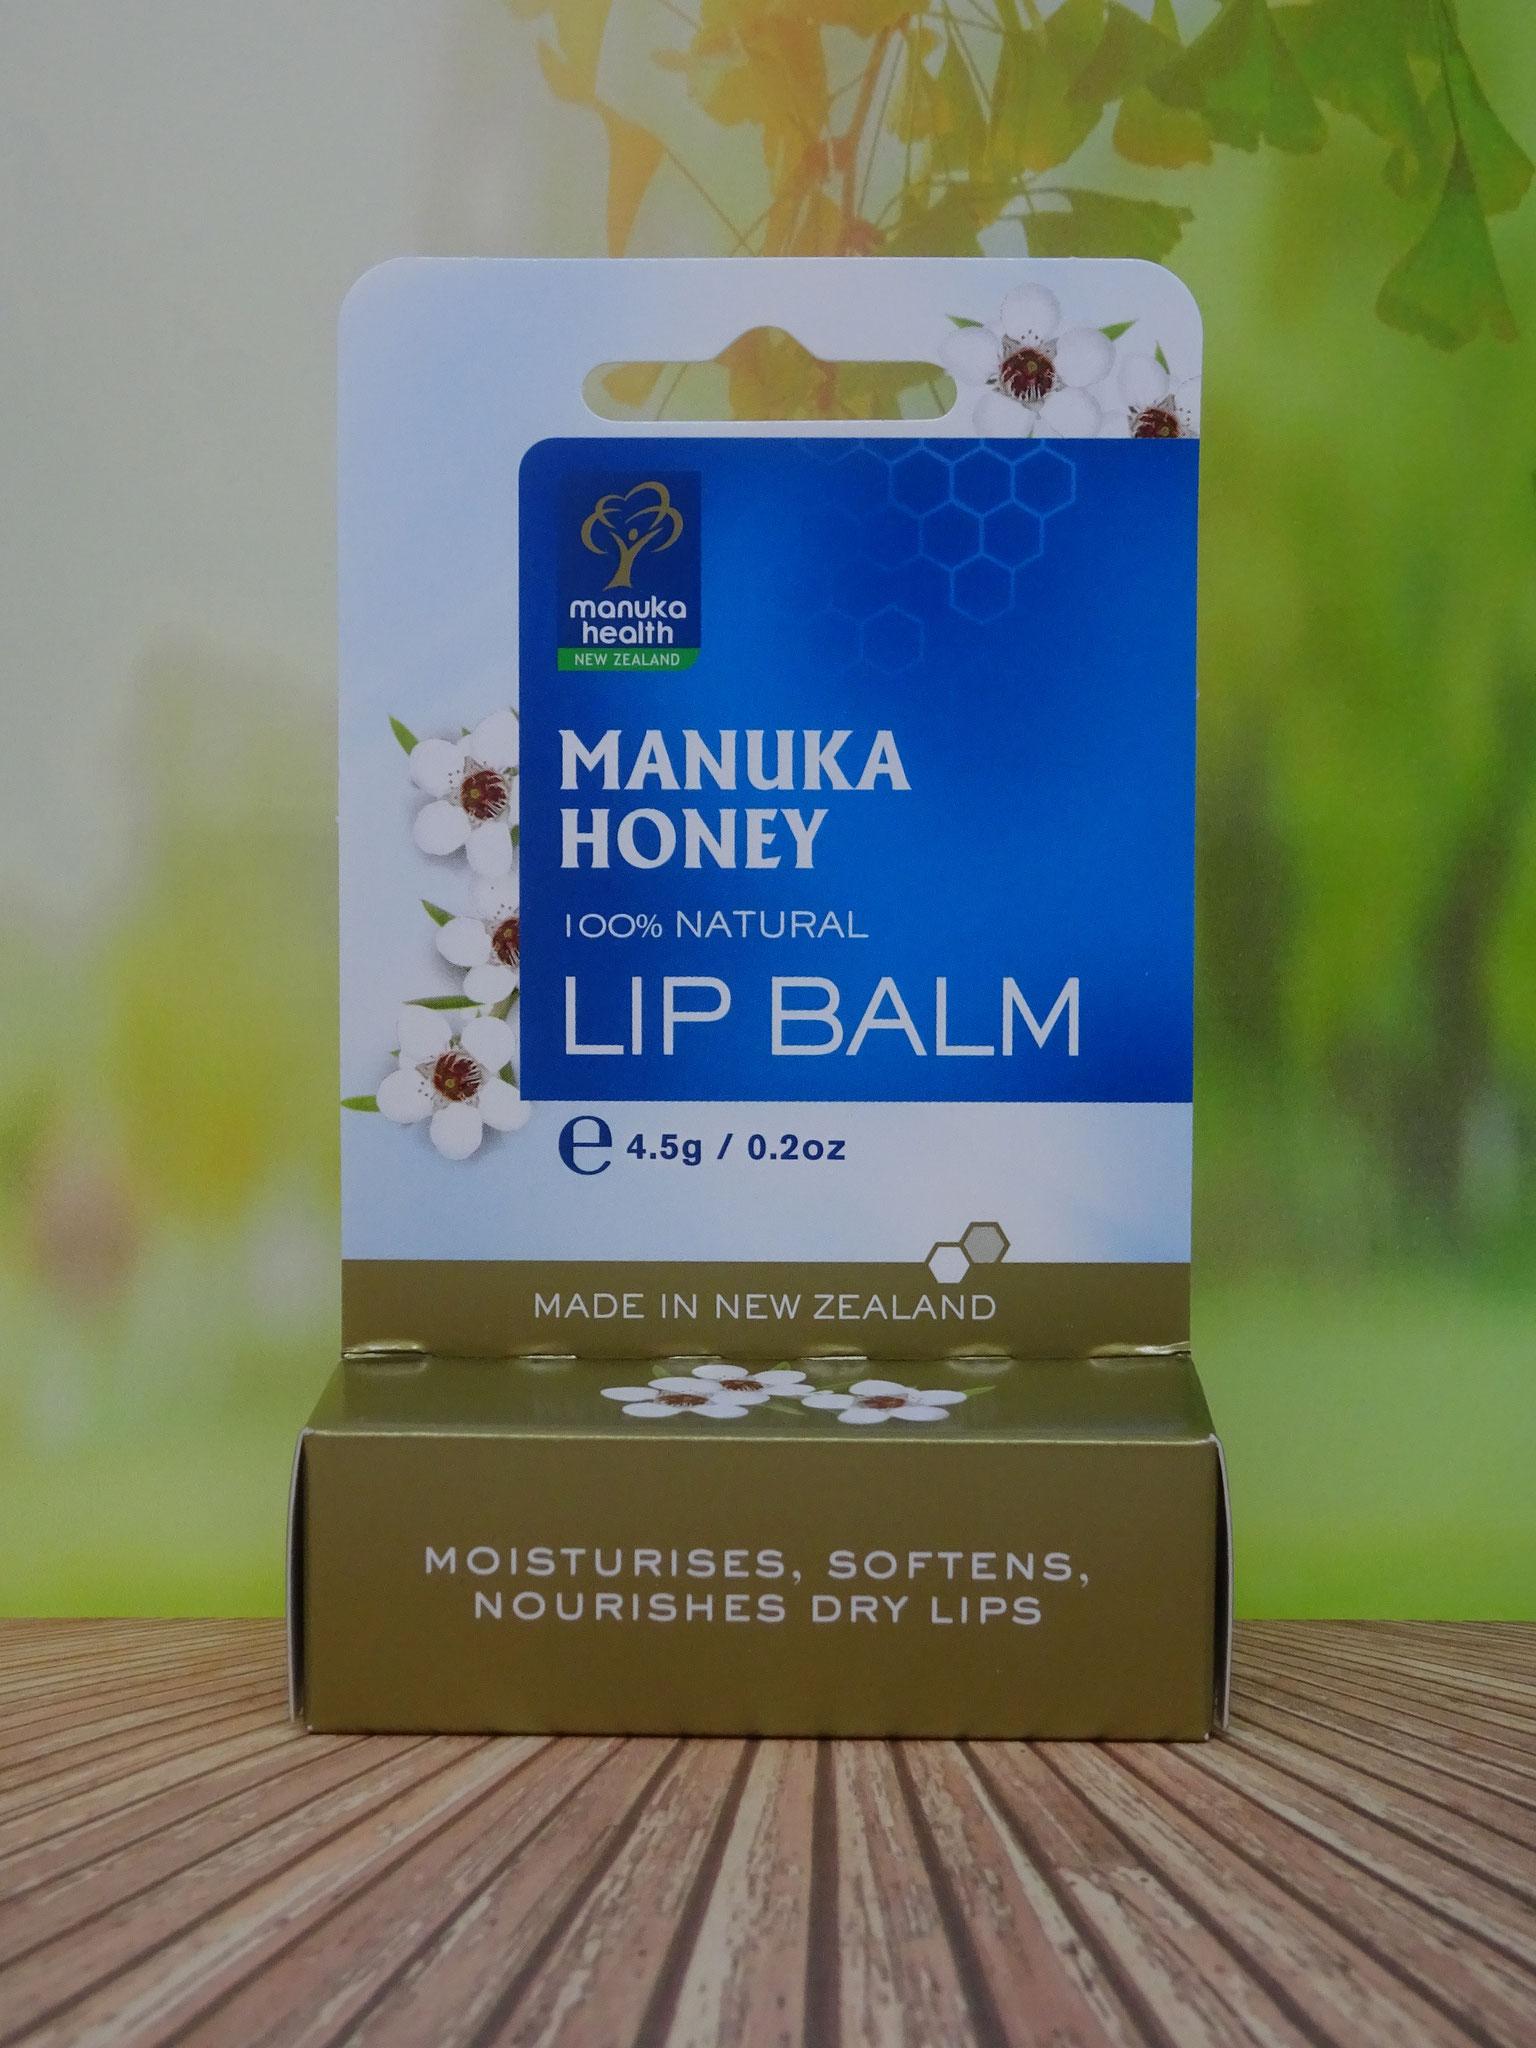 Manuka Honig Lippenbalsam (Manuka Health New Zealand)